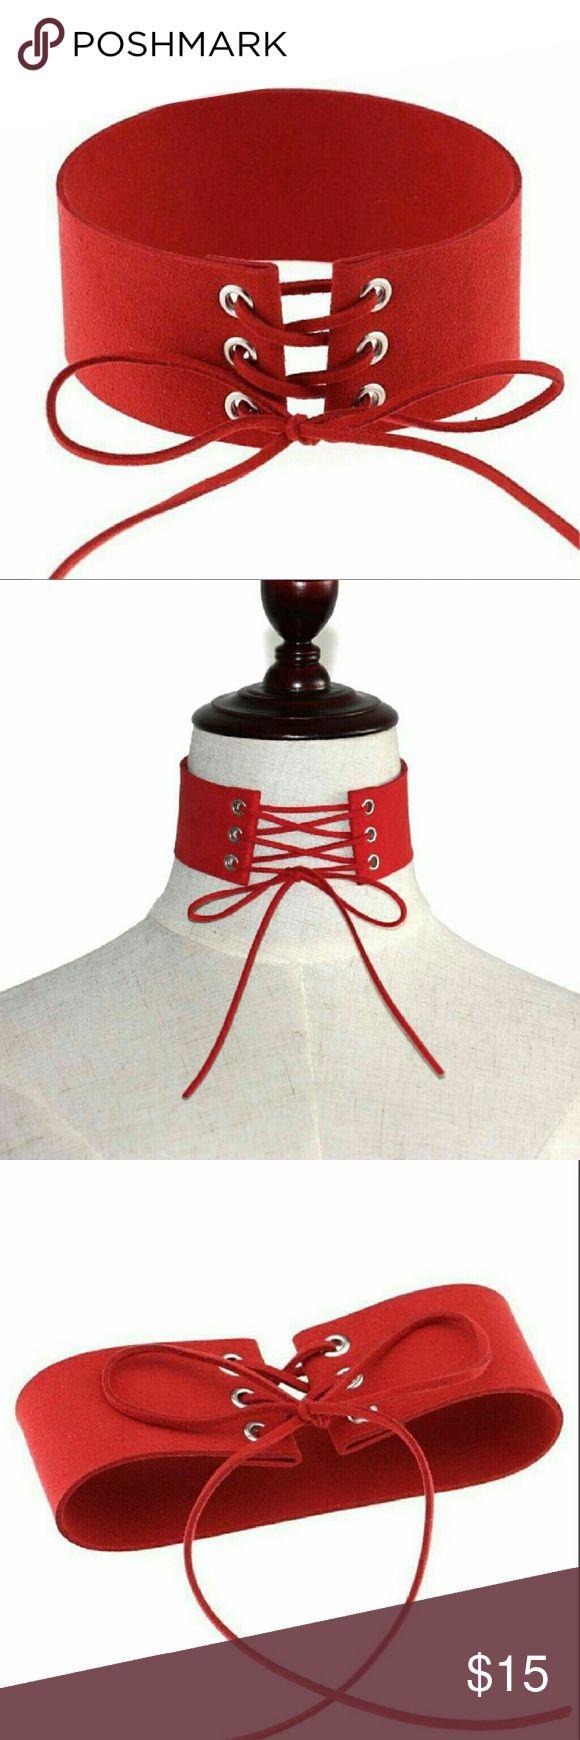 Vintage Punk Red Leather Laceup Choker Necklace Women Punk Necklace Velvet Laceup Gothic Choker Vintage Leather Red Jewelry Jewelry Necklaces